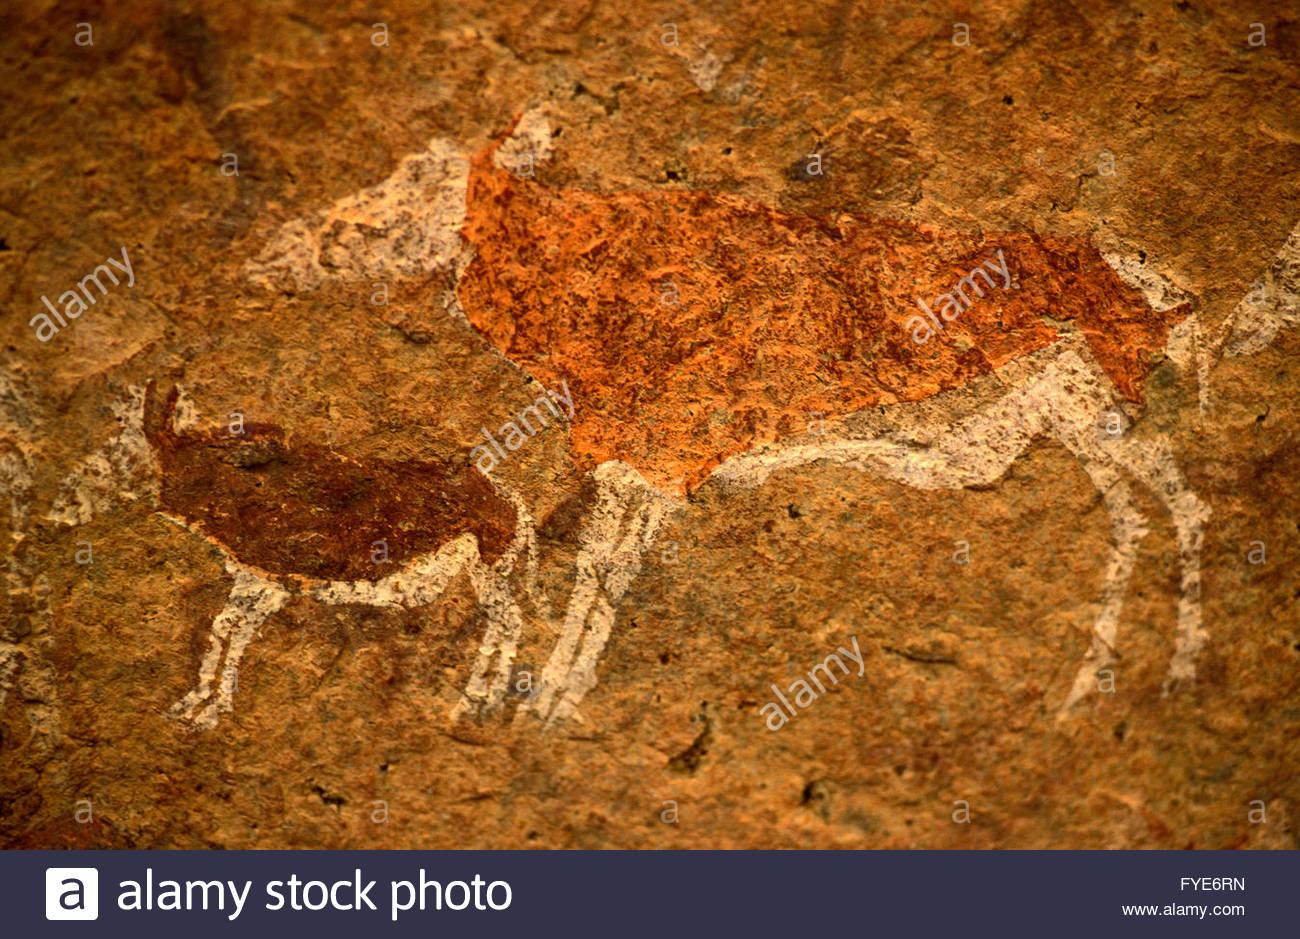 A Bushman (San) rock carving Brandberg Mountains Namibia - Stock Image